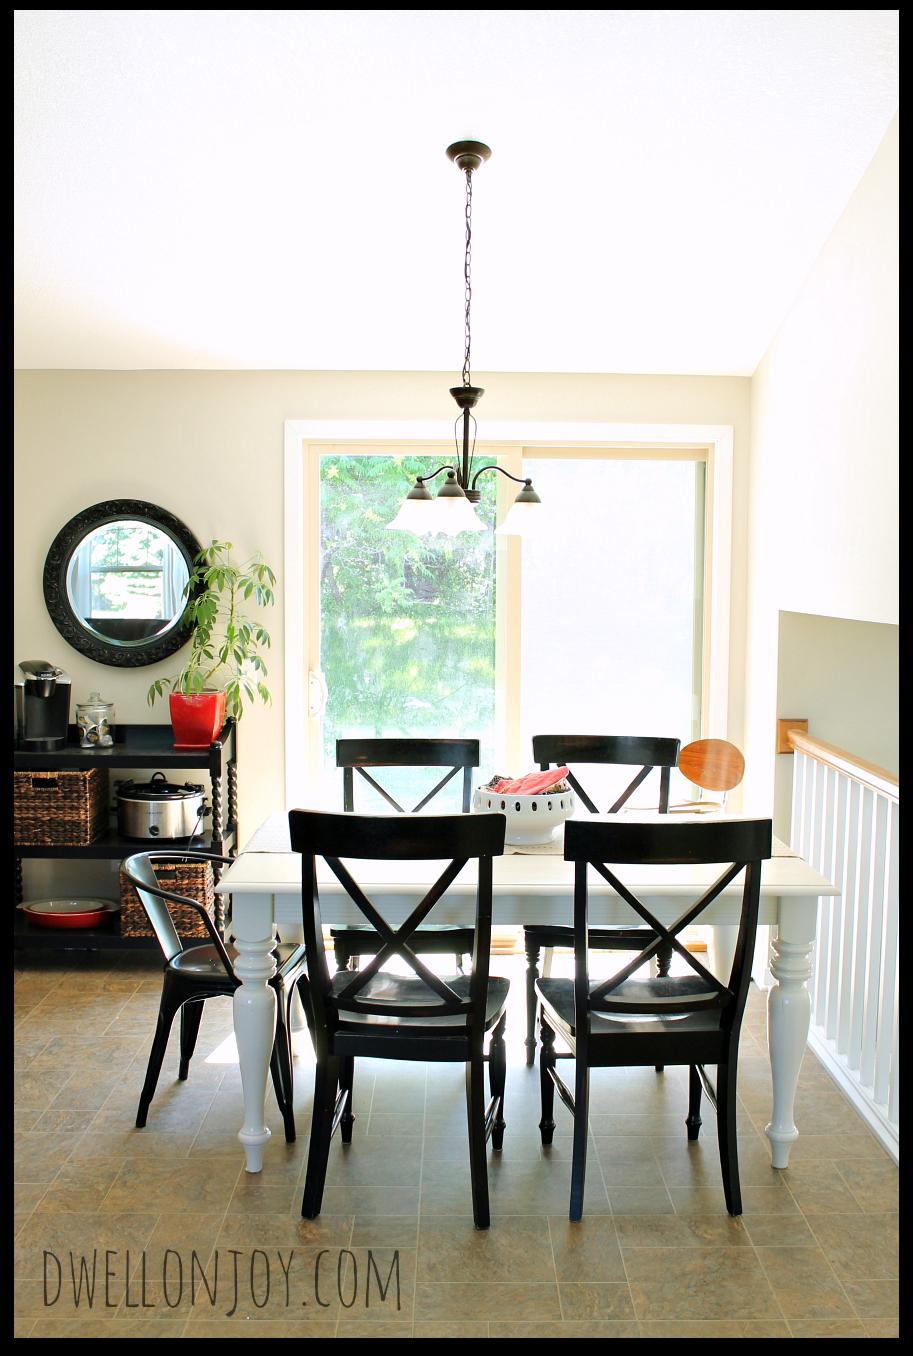 dwell on joy june white kitchen chairs target gaudem